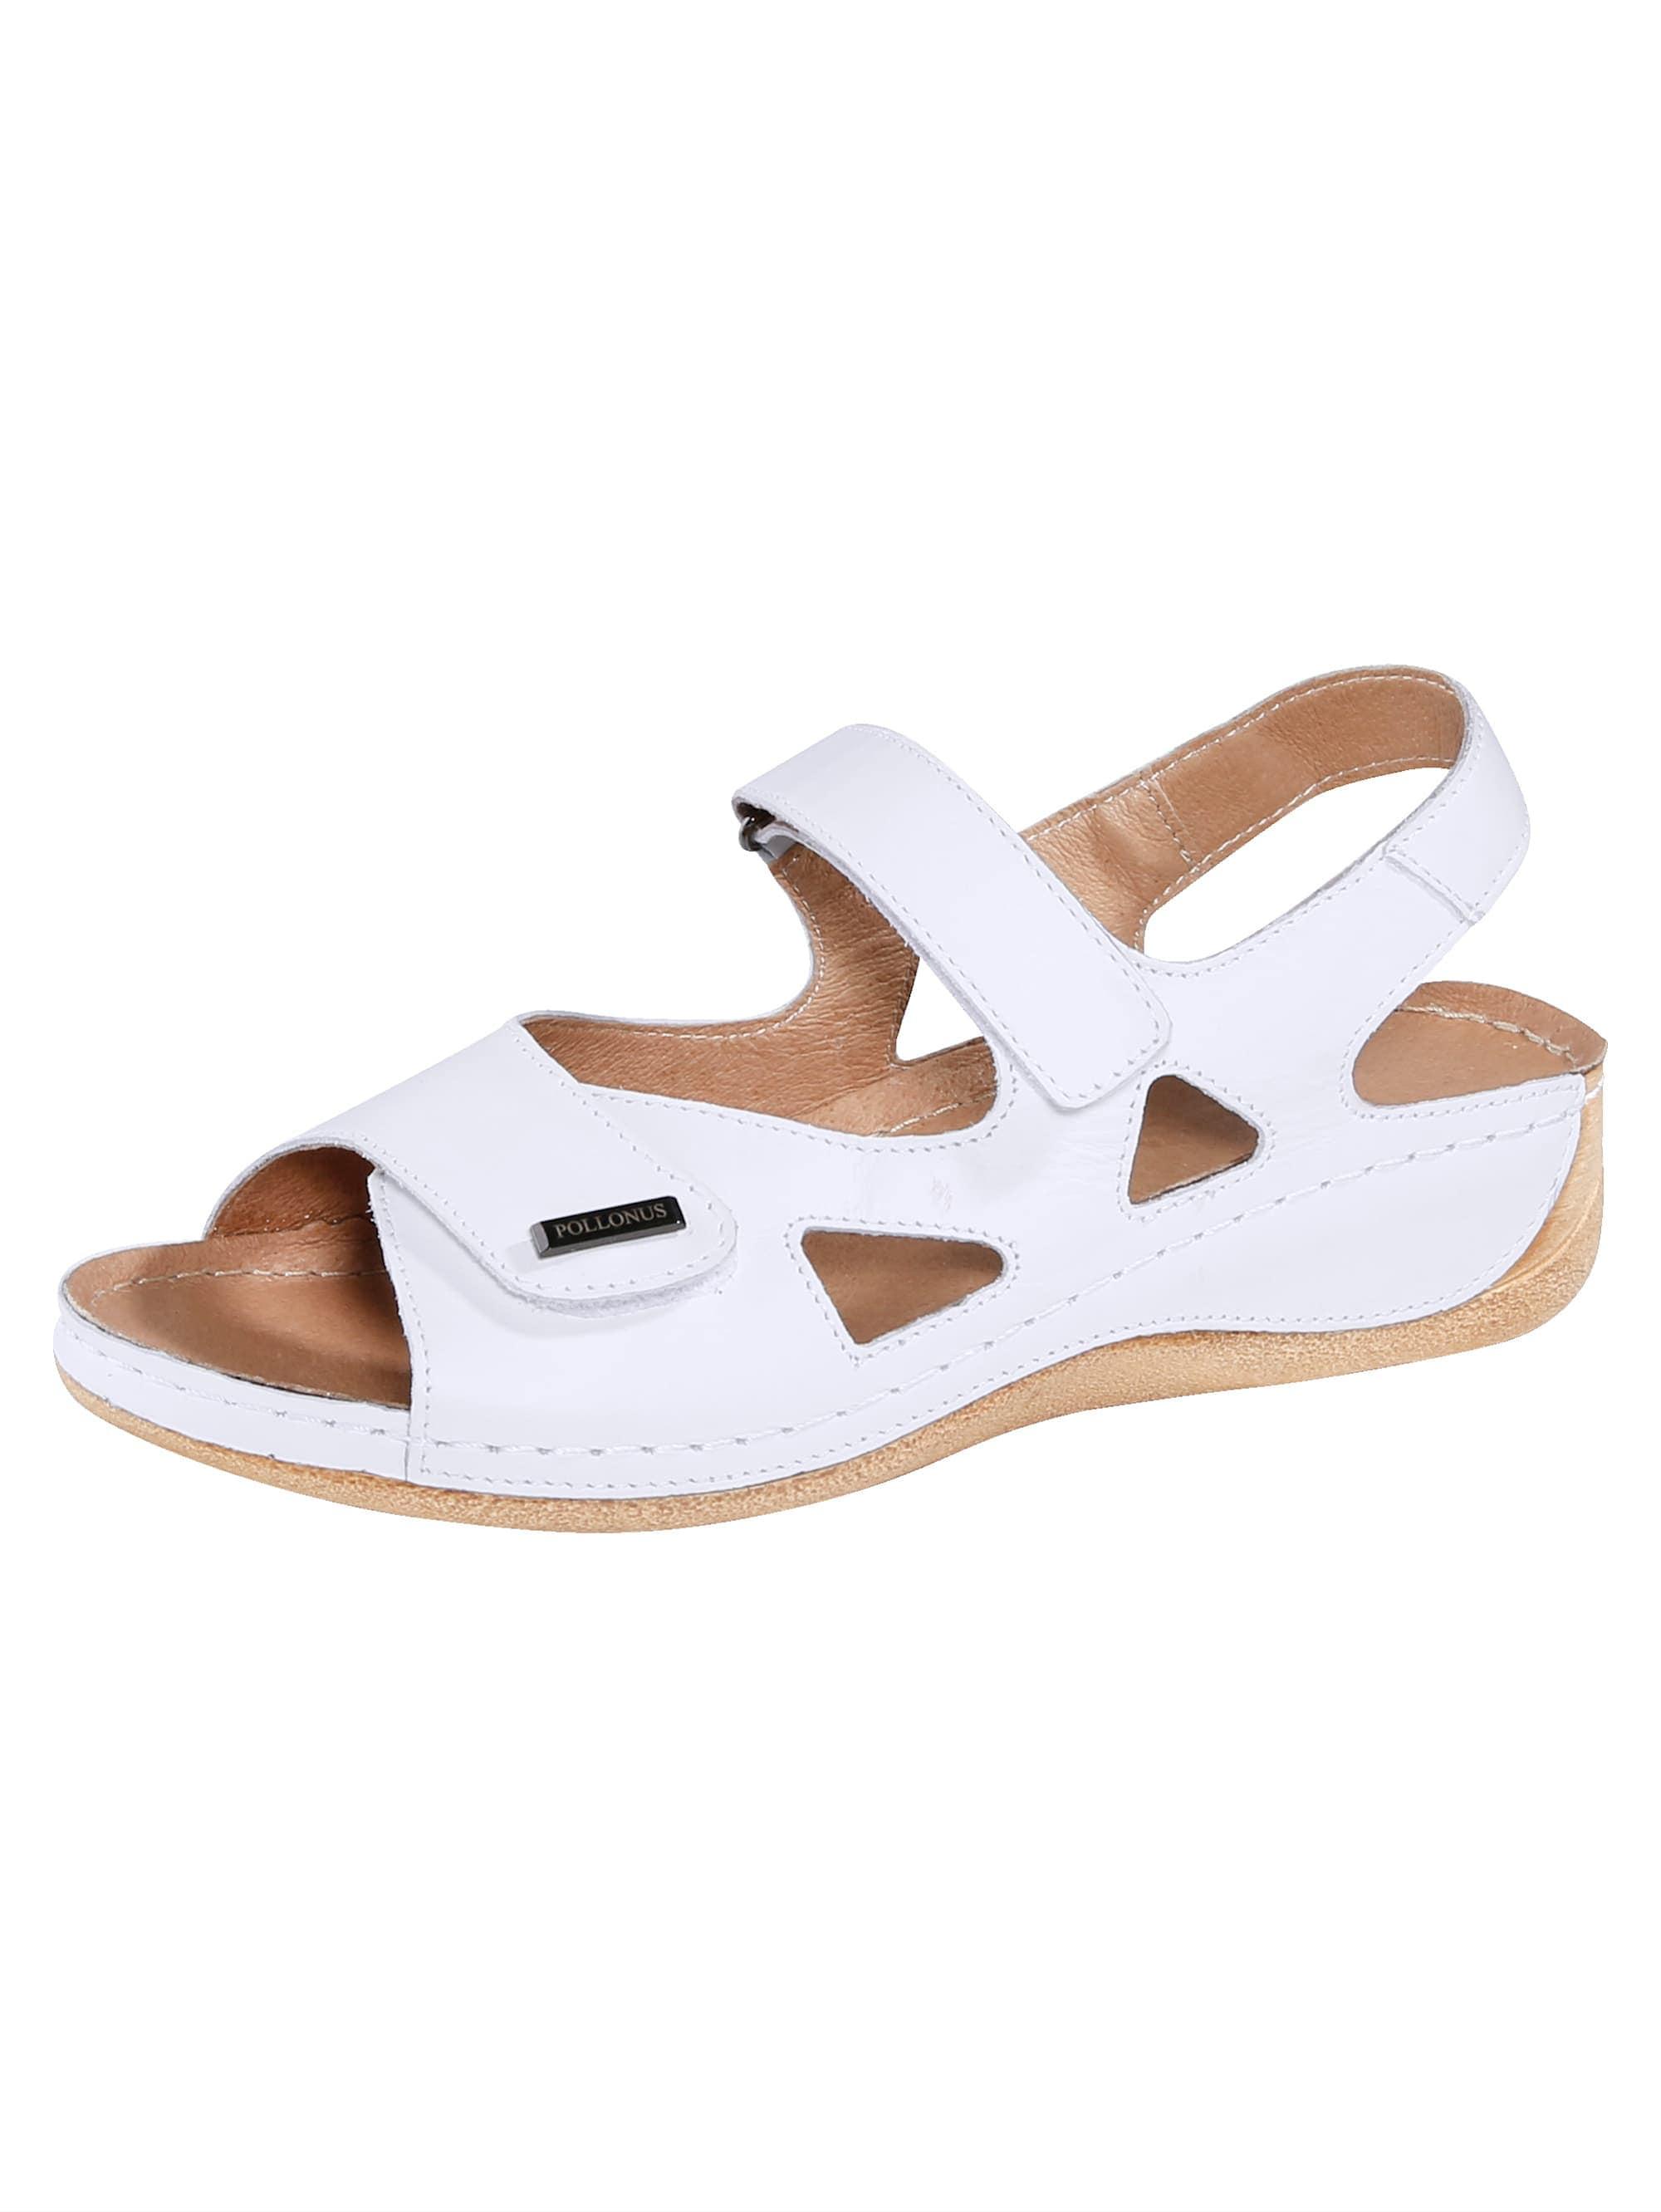 Naturläufer Sandale weiß Damen Sandaletten Sandalen Sandalen/